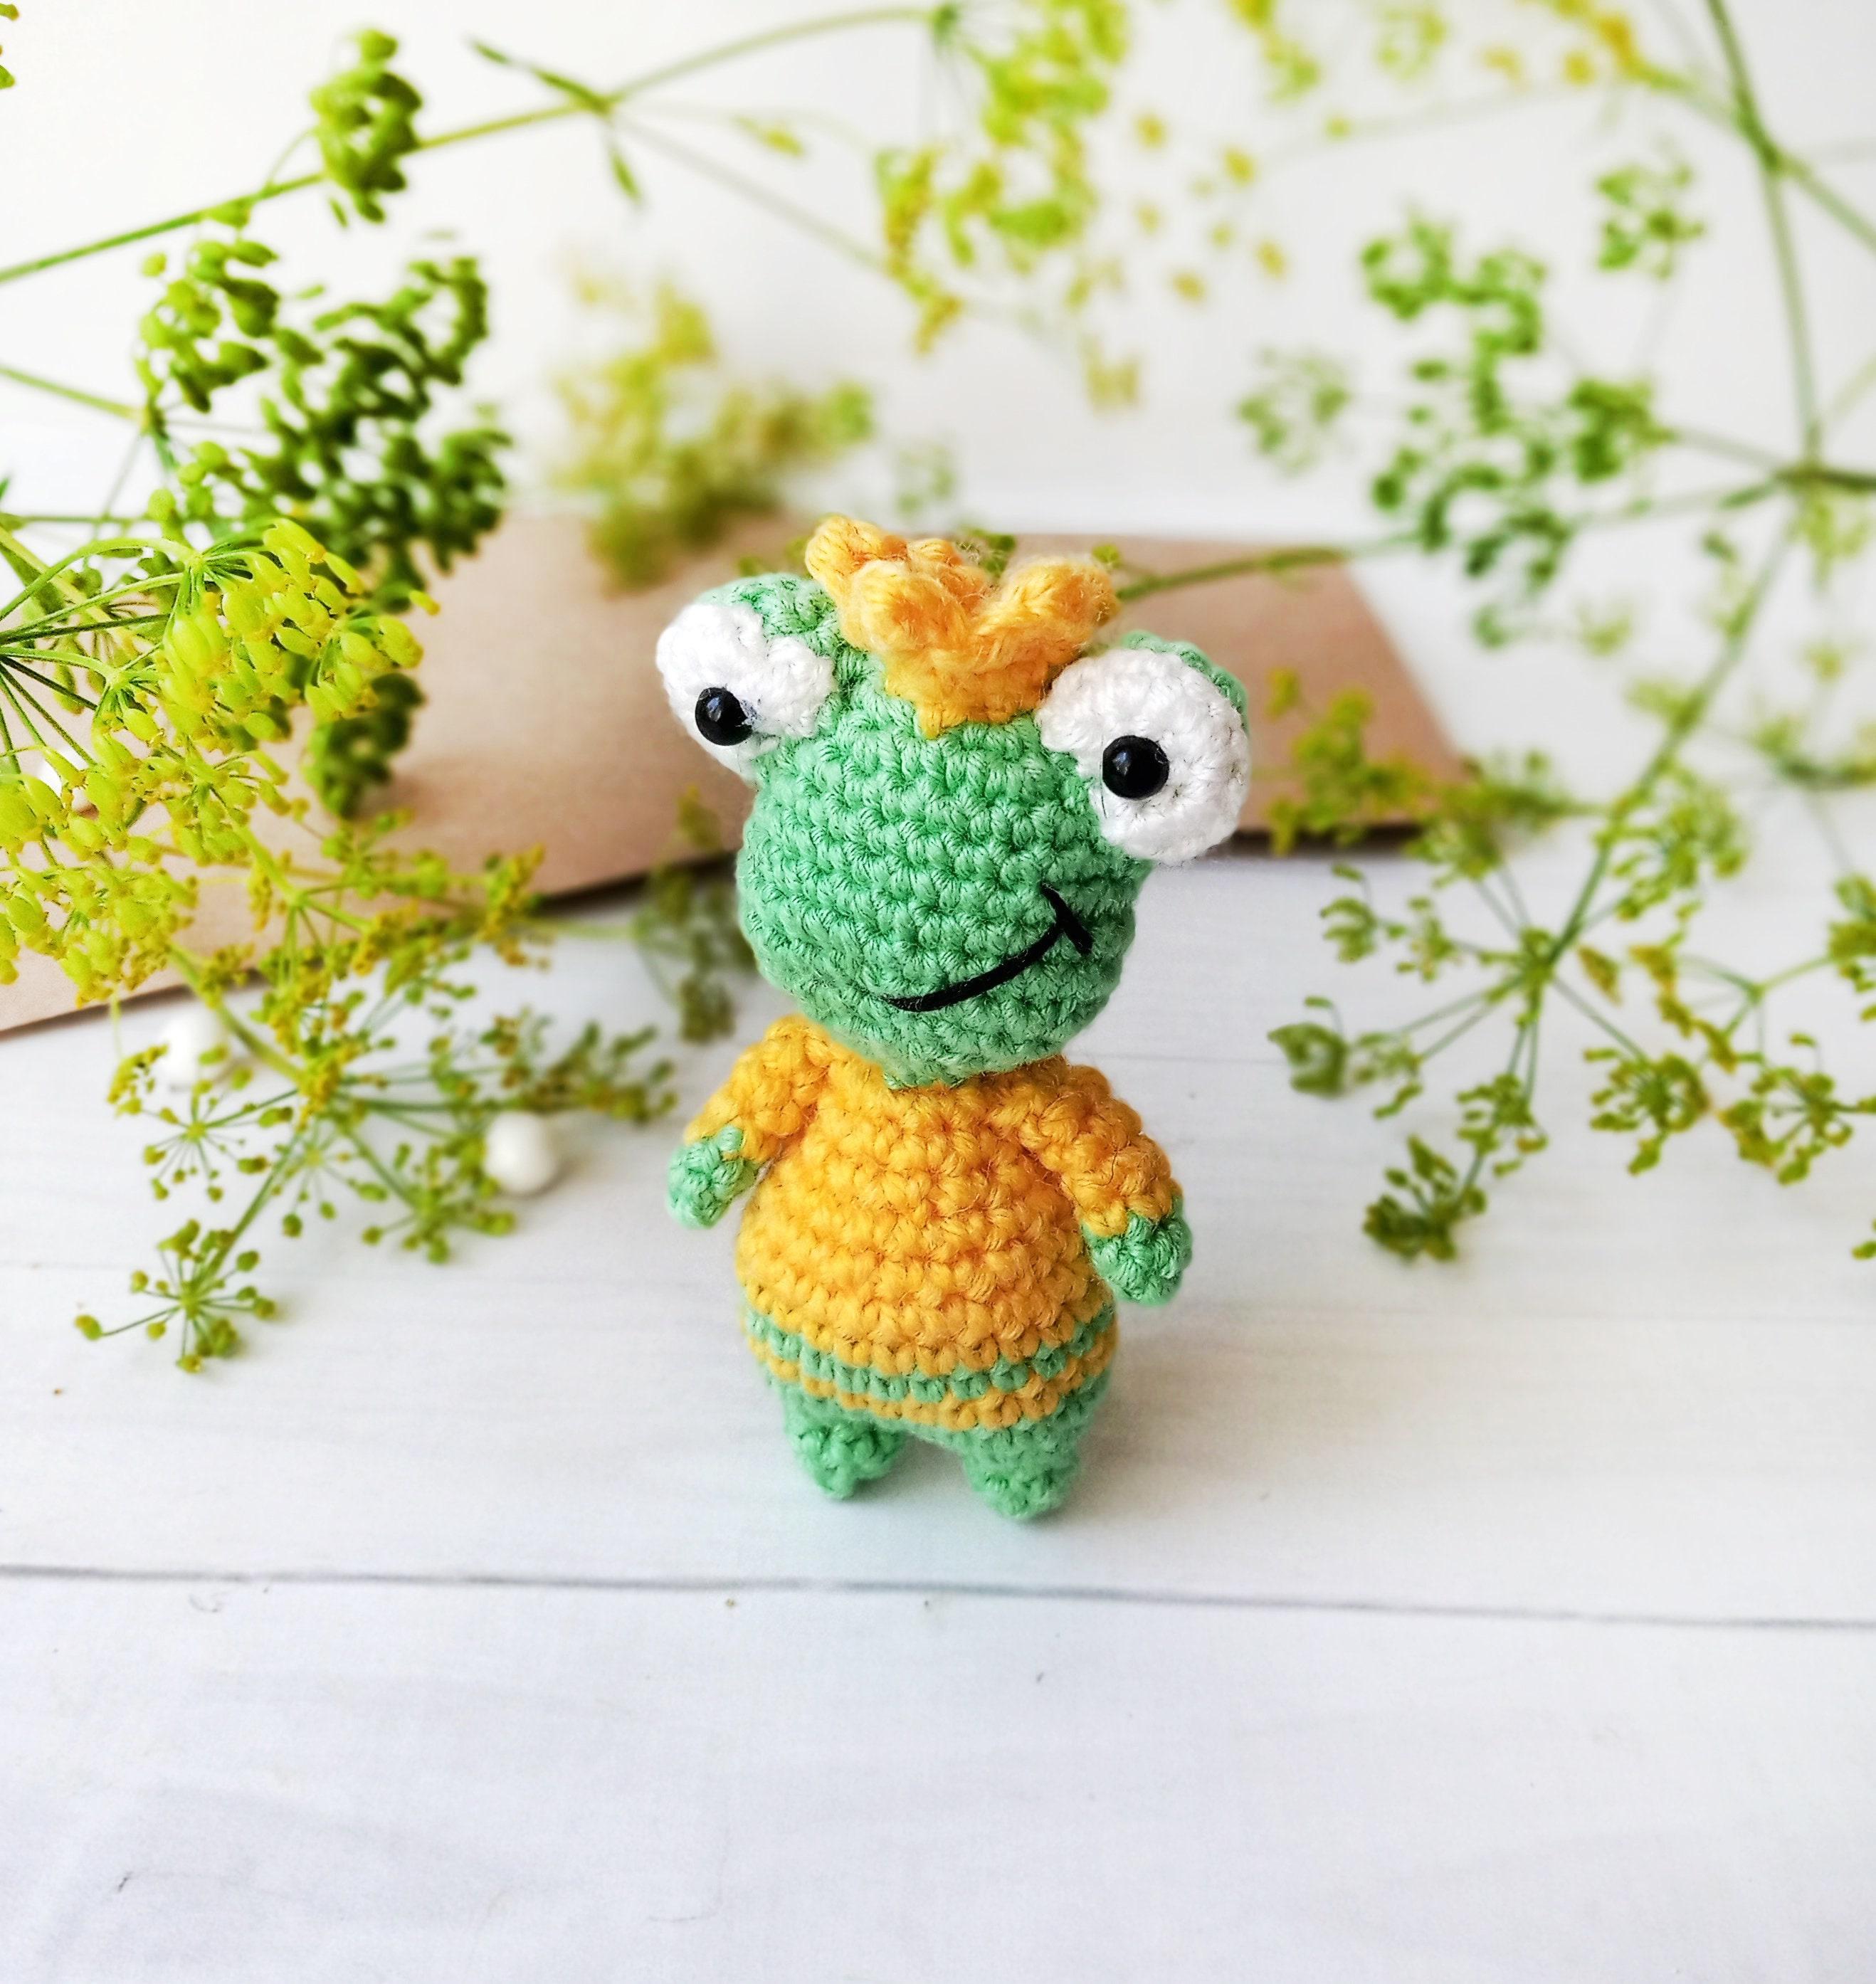 Mini keychain amigurumi toy, toy frog, keychain for School backpack, keychain for bag